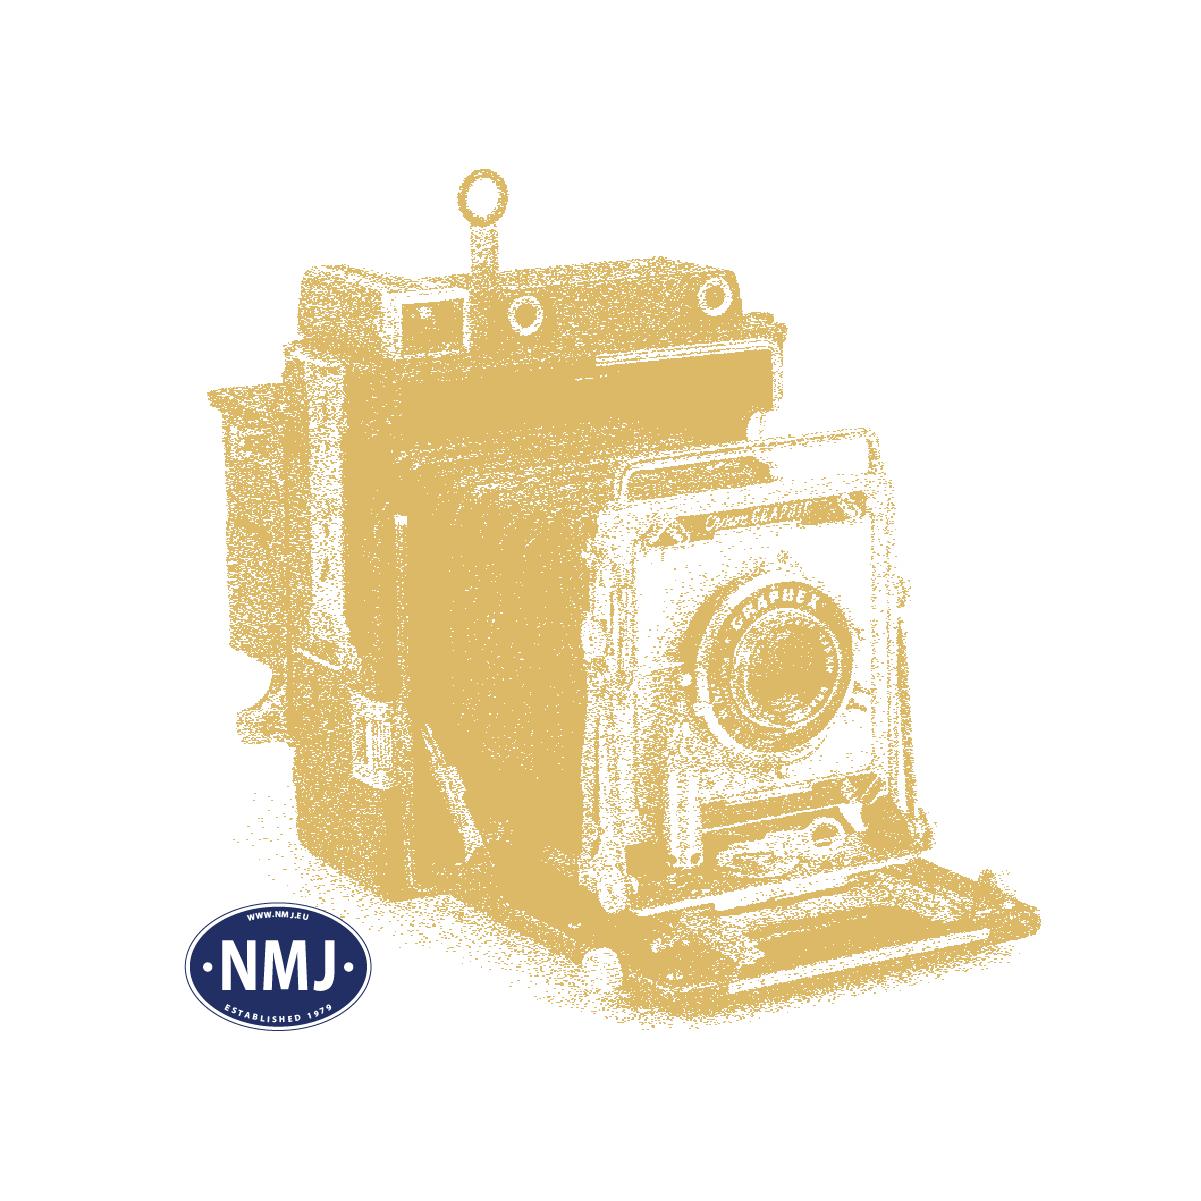 NMJT404.102 - NMJ Topline MAV Personvogn Bmz 21-91 104-5, 2. Cl. Compartment